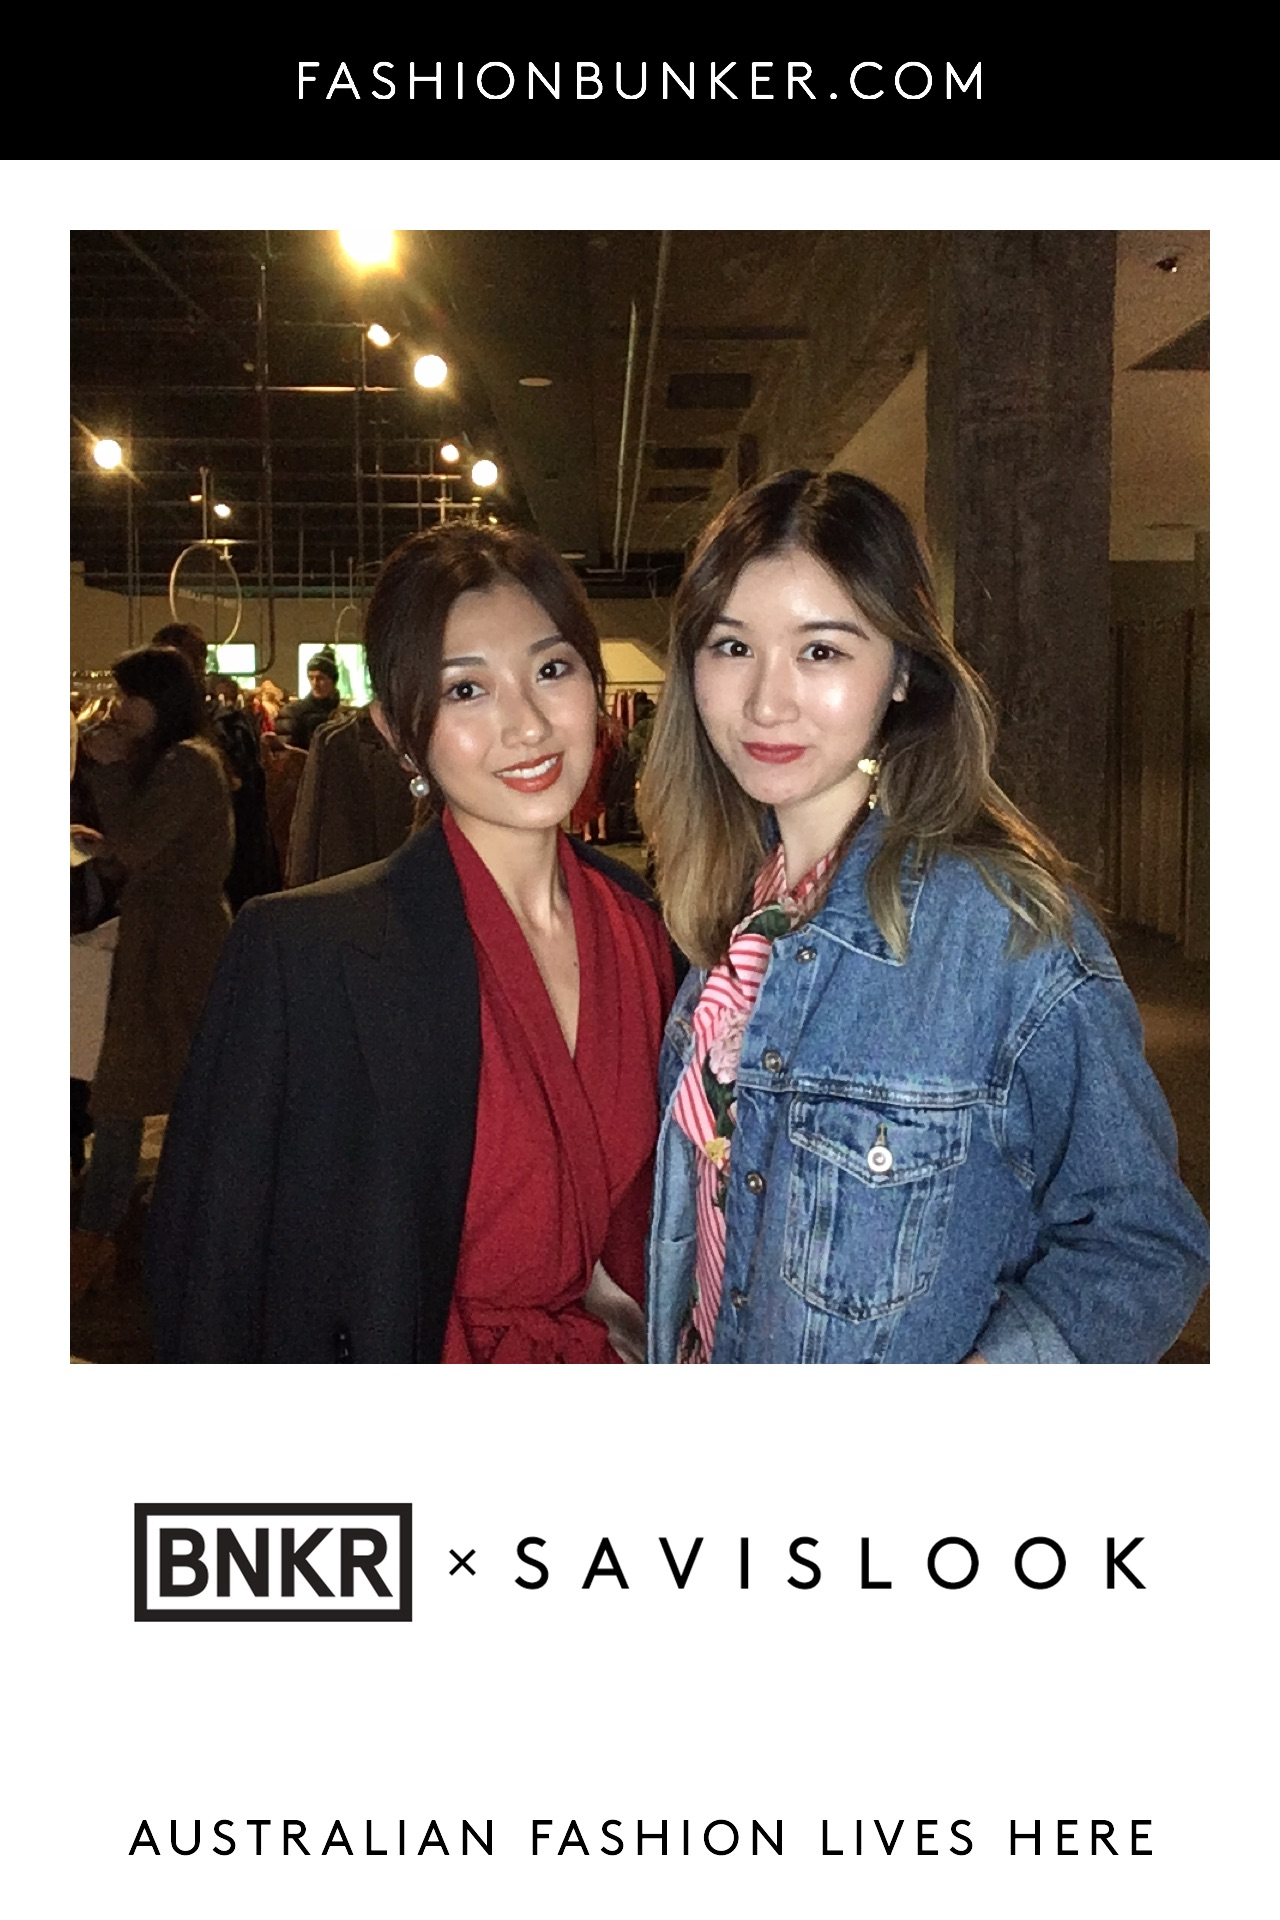 @savislook visits BNKR